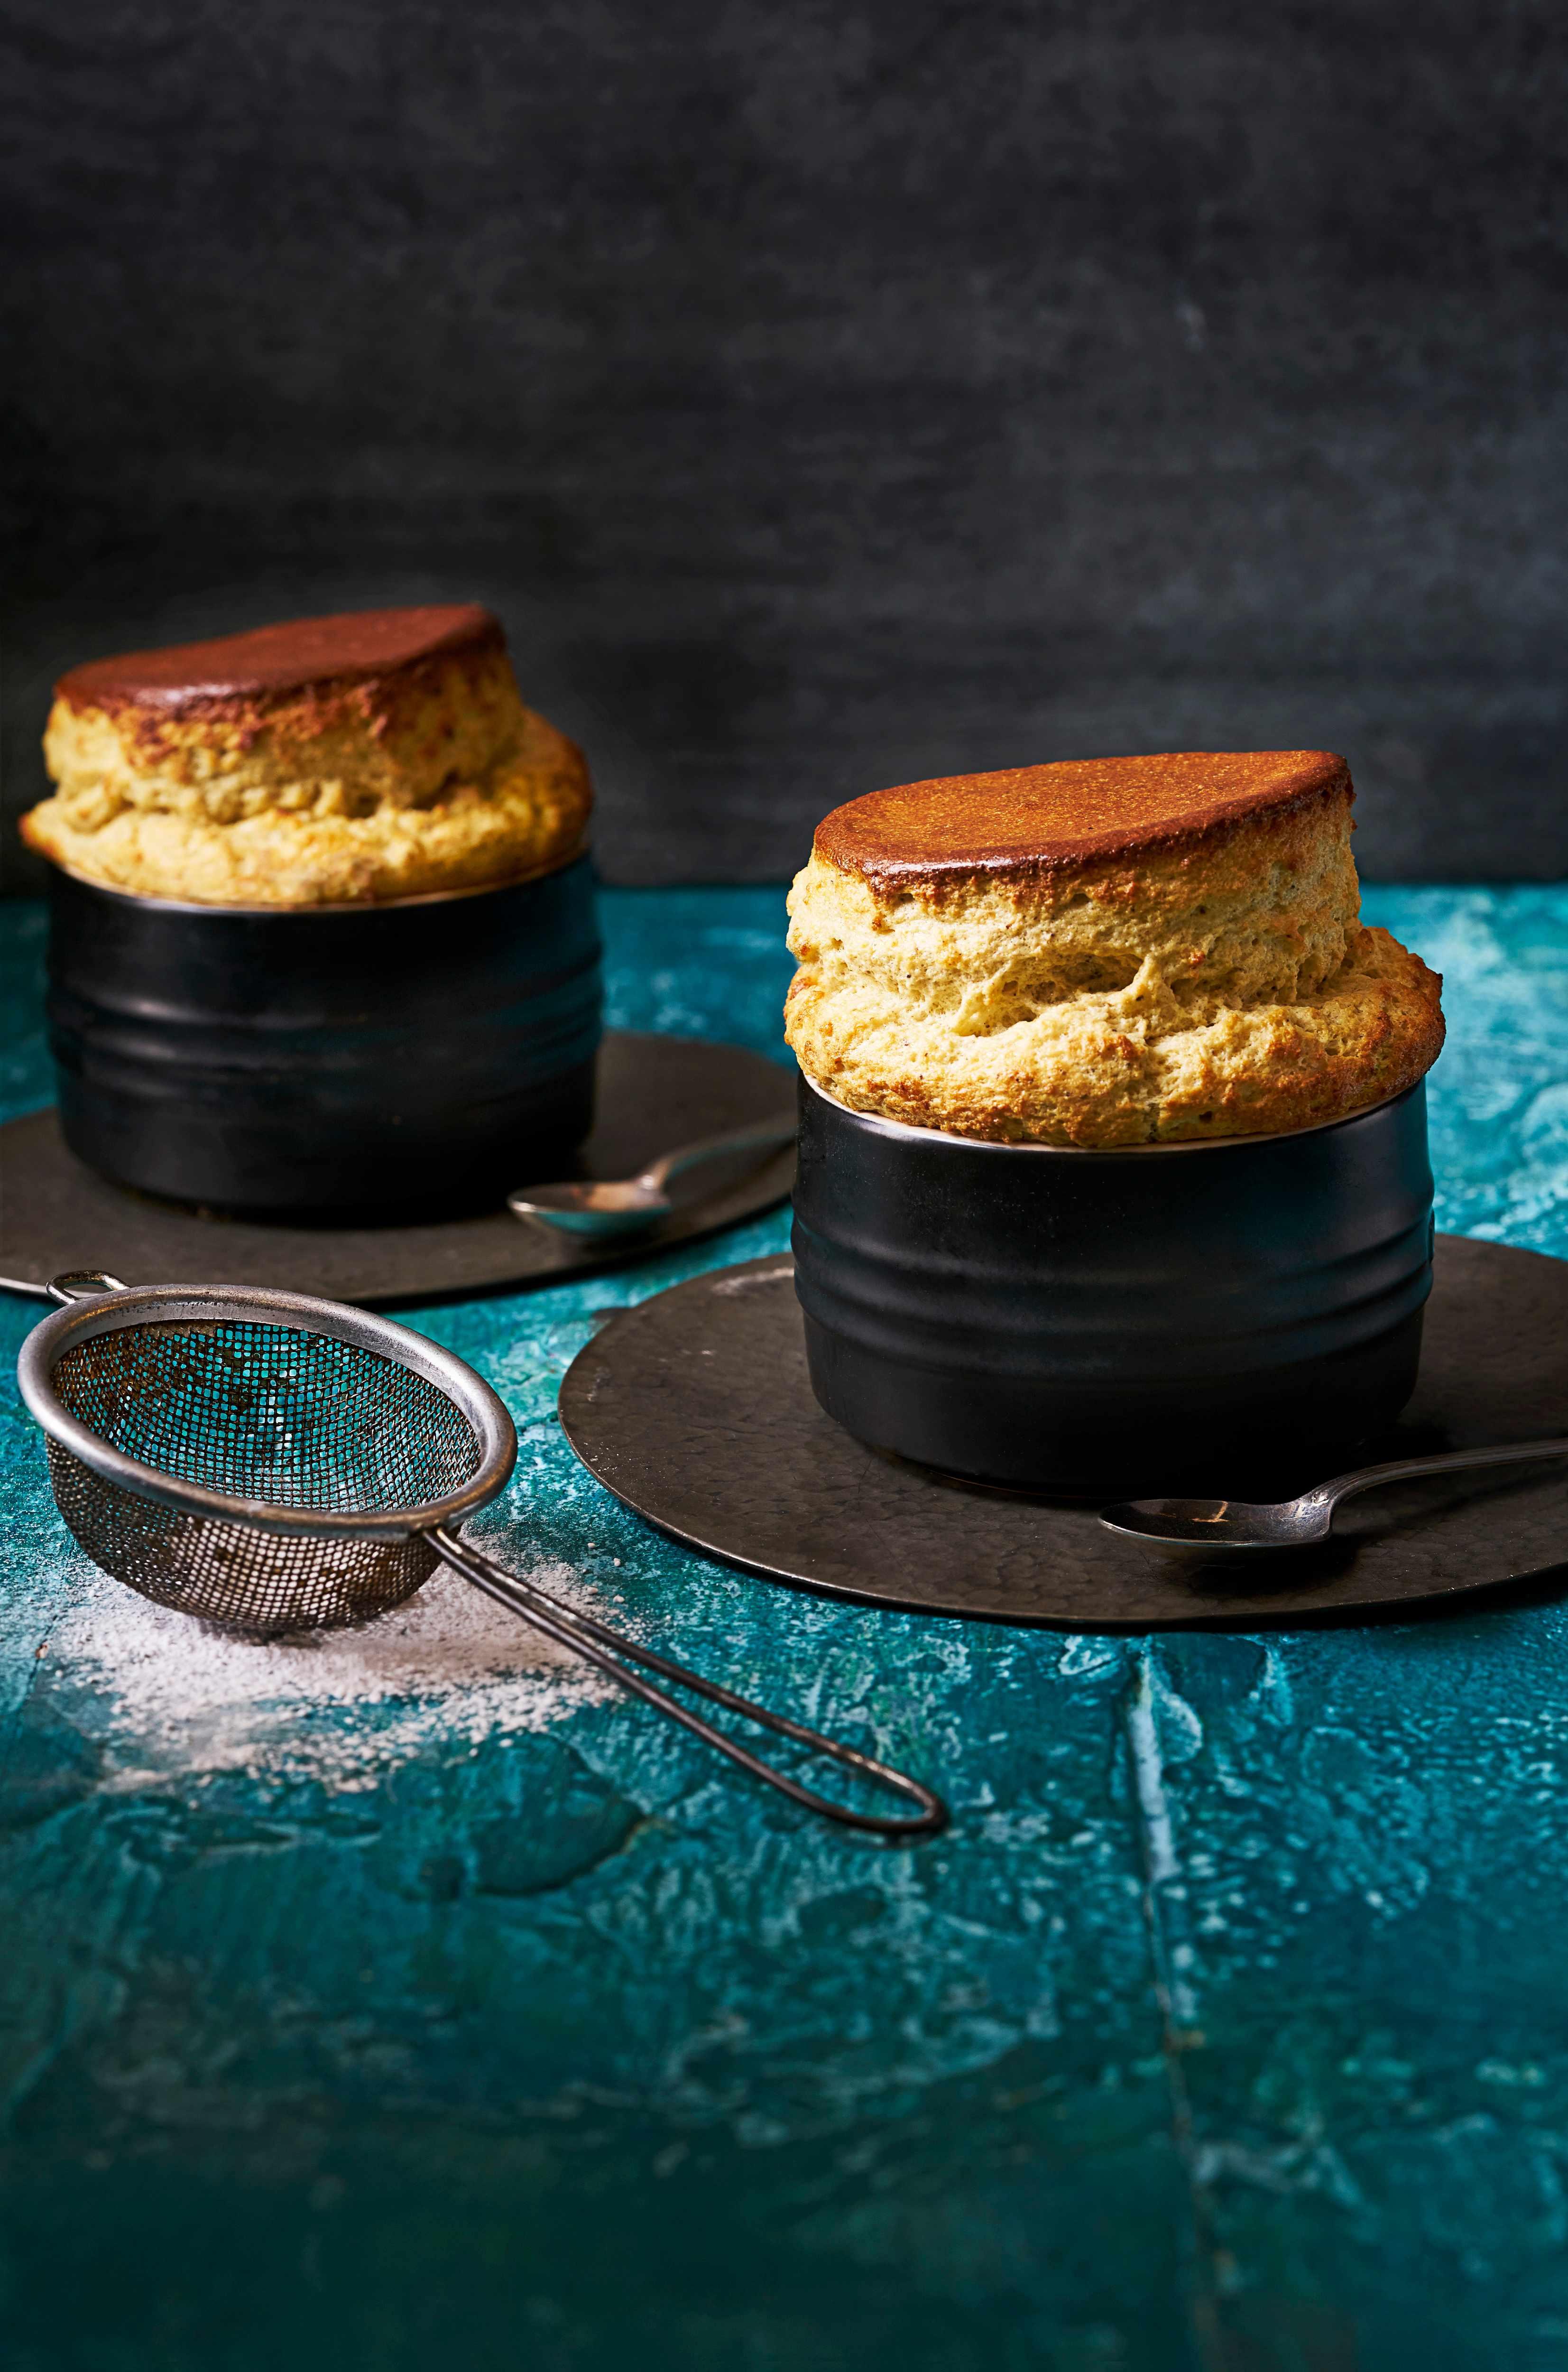 Pistachio and white chocolate soufflé